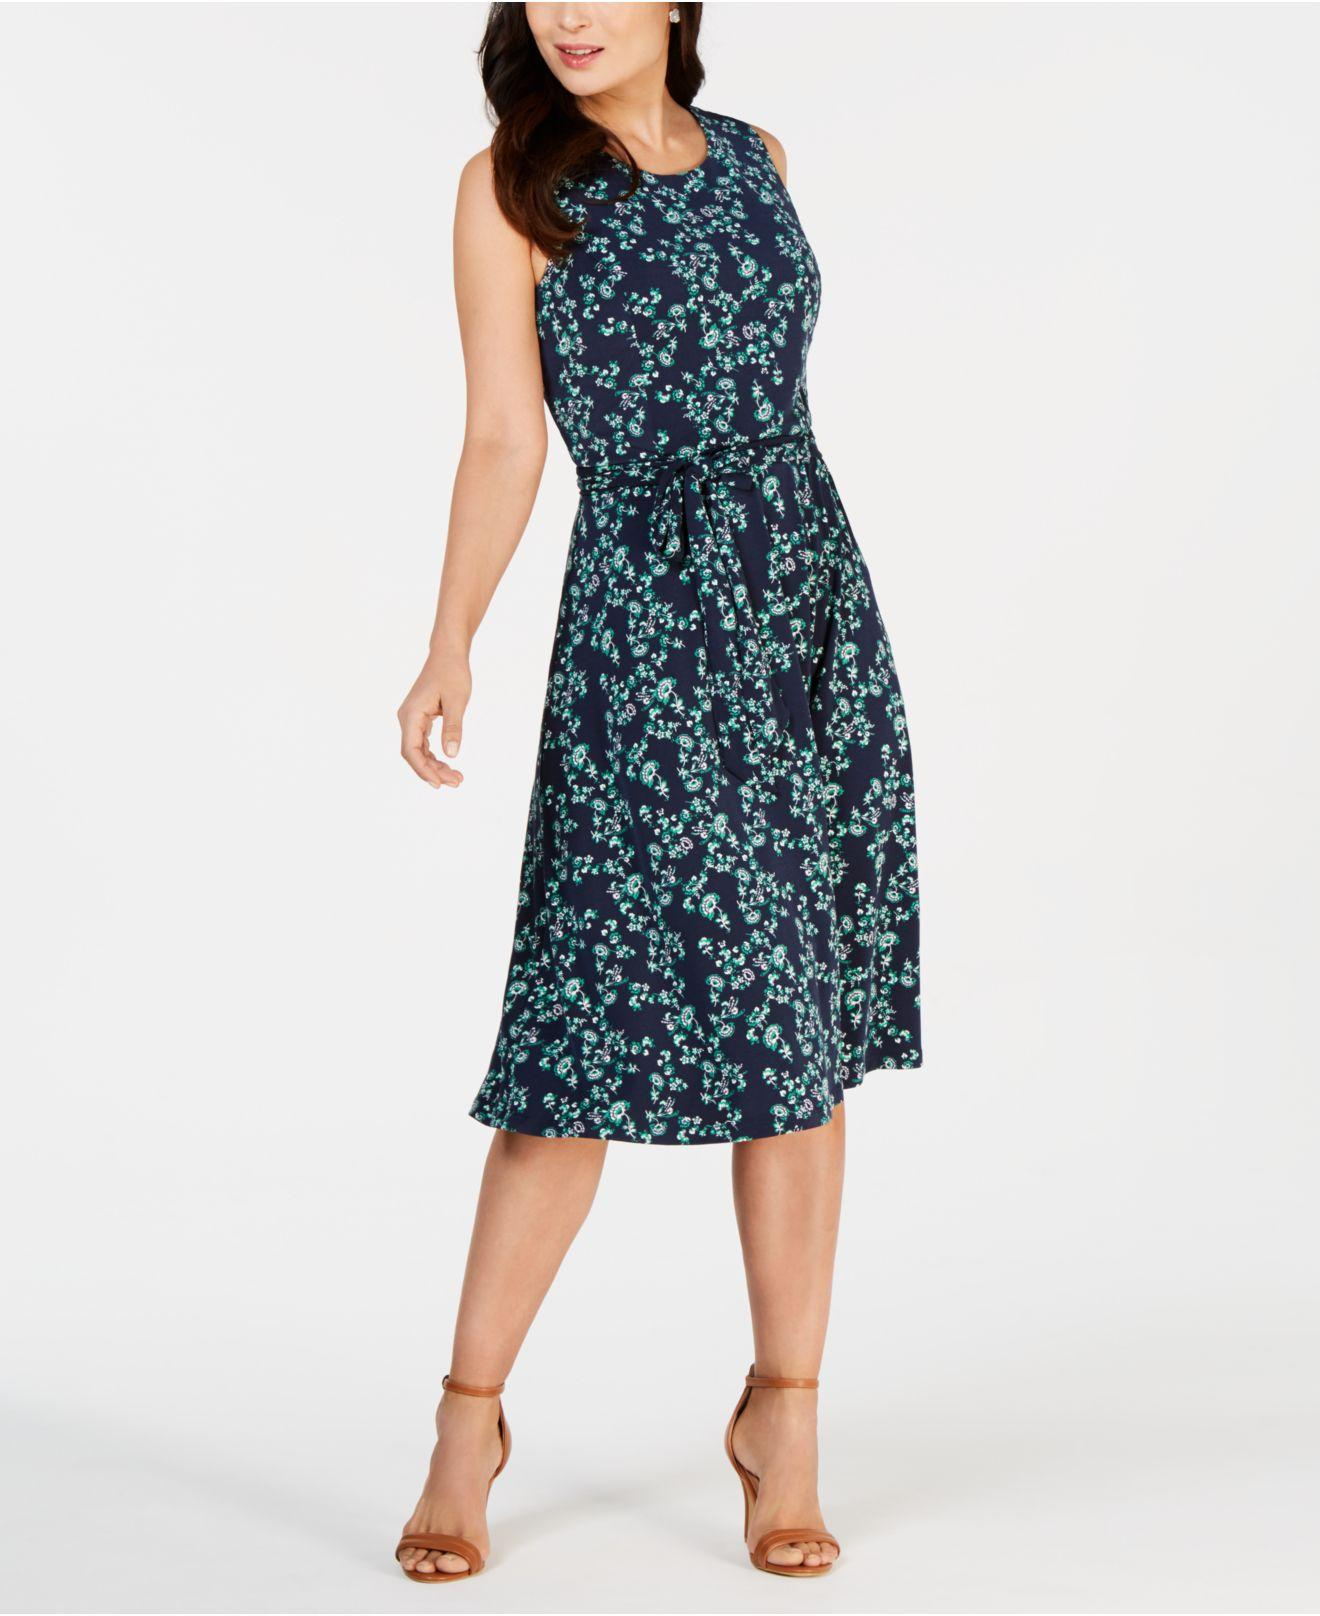 b5fa2a2533 Charter Club. Women s Blue Printed Midi Dress ...